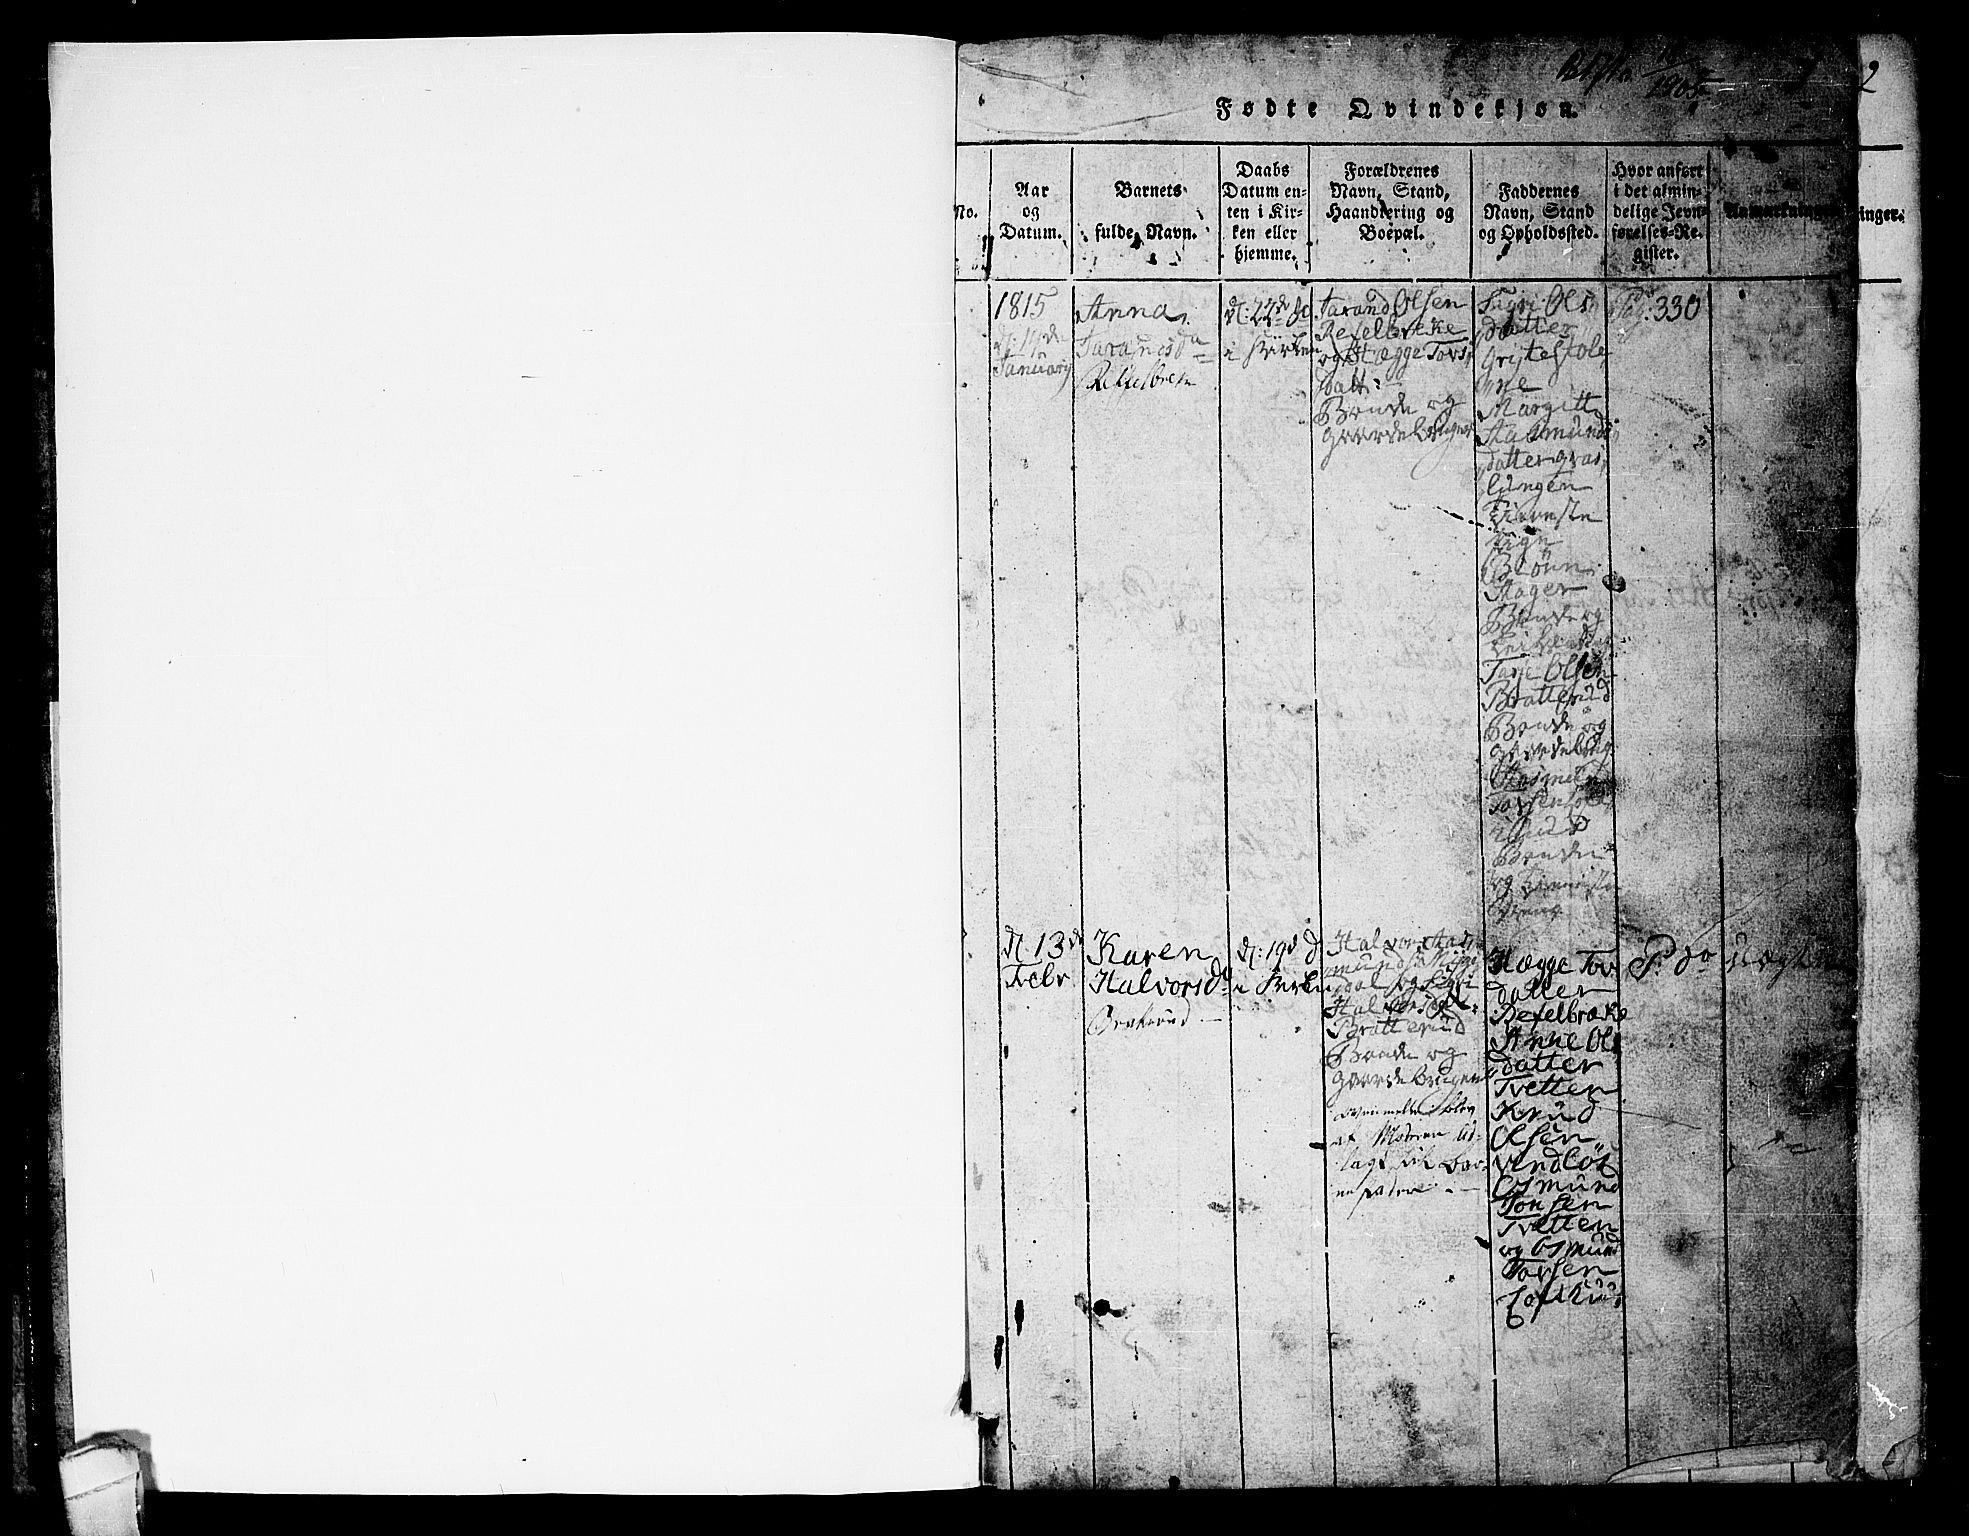 SAKO, Lårdal kirkebøker, G/Gb/L0001: Klokkerbok nr. II 1, 1815-1865, s. 1